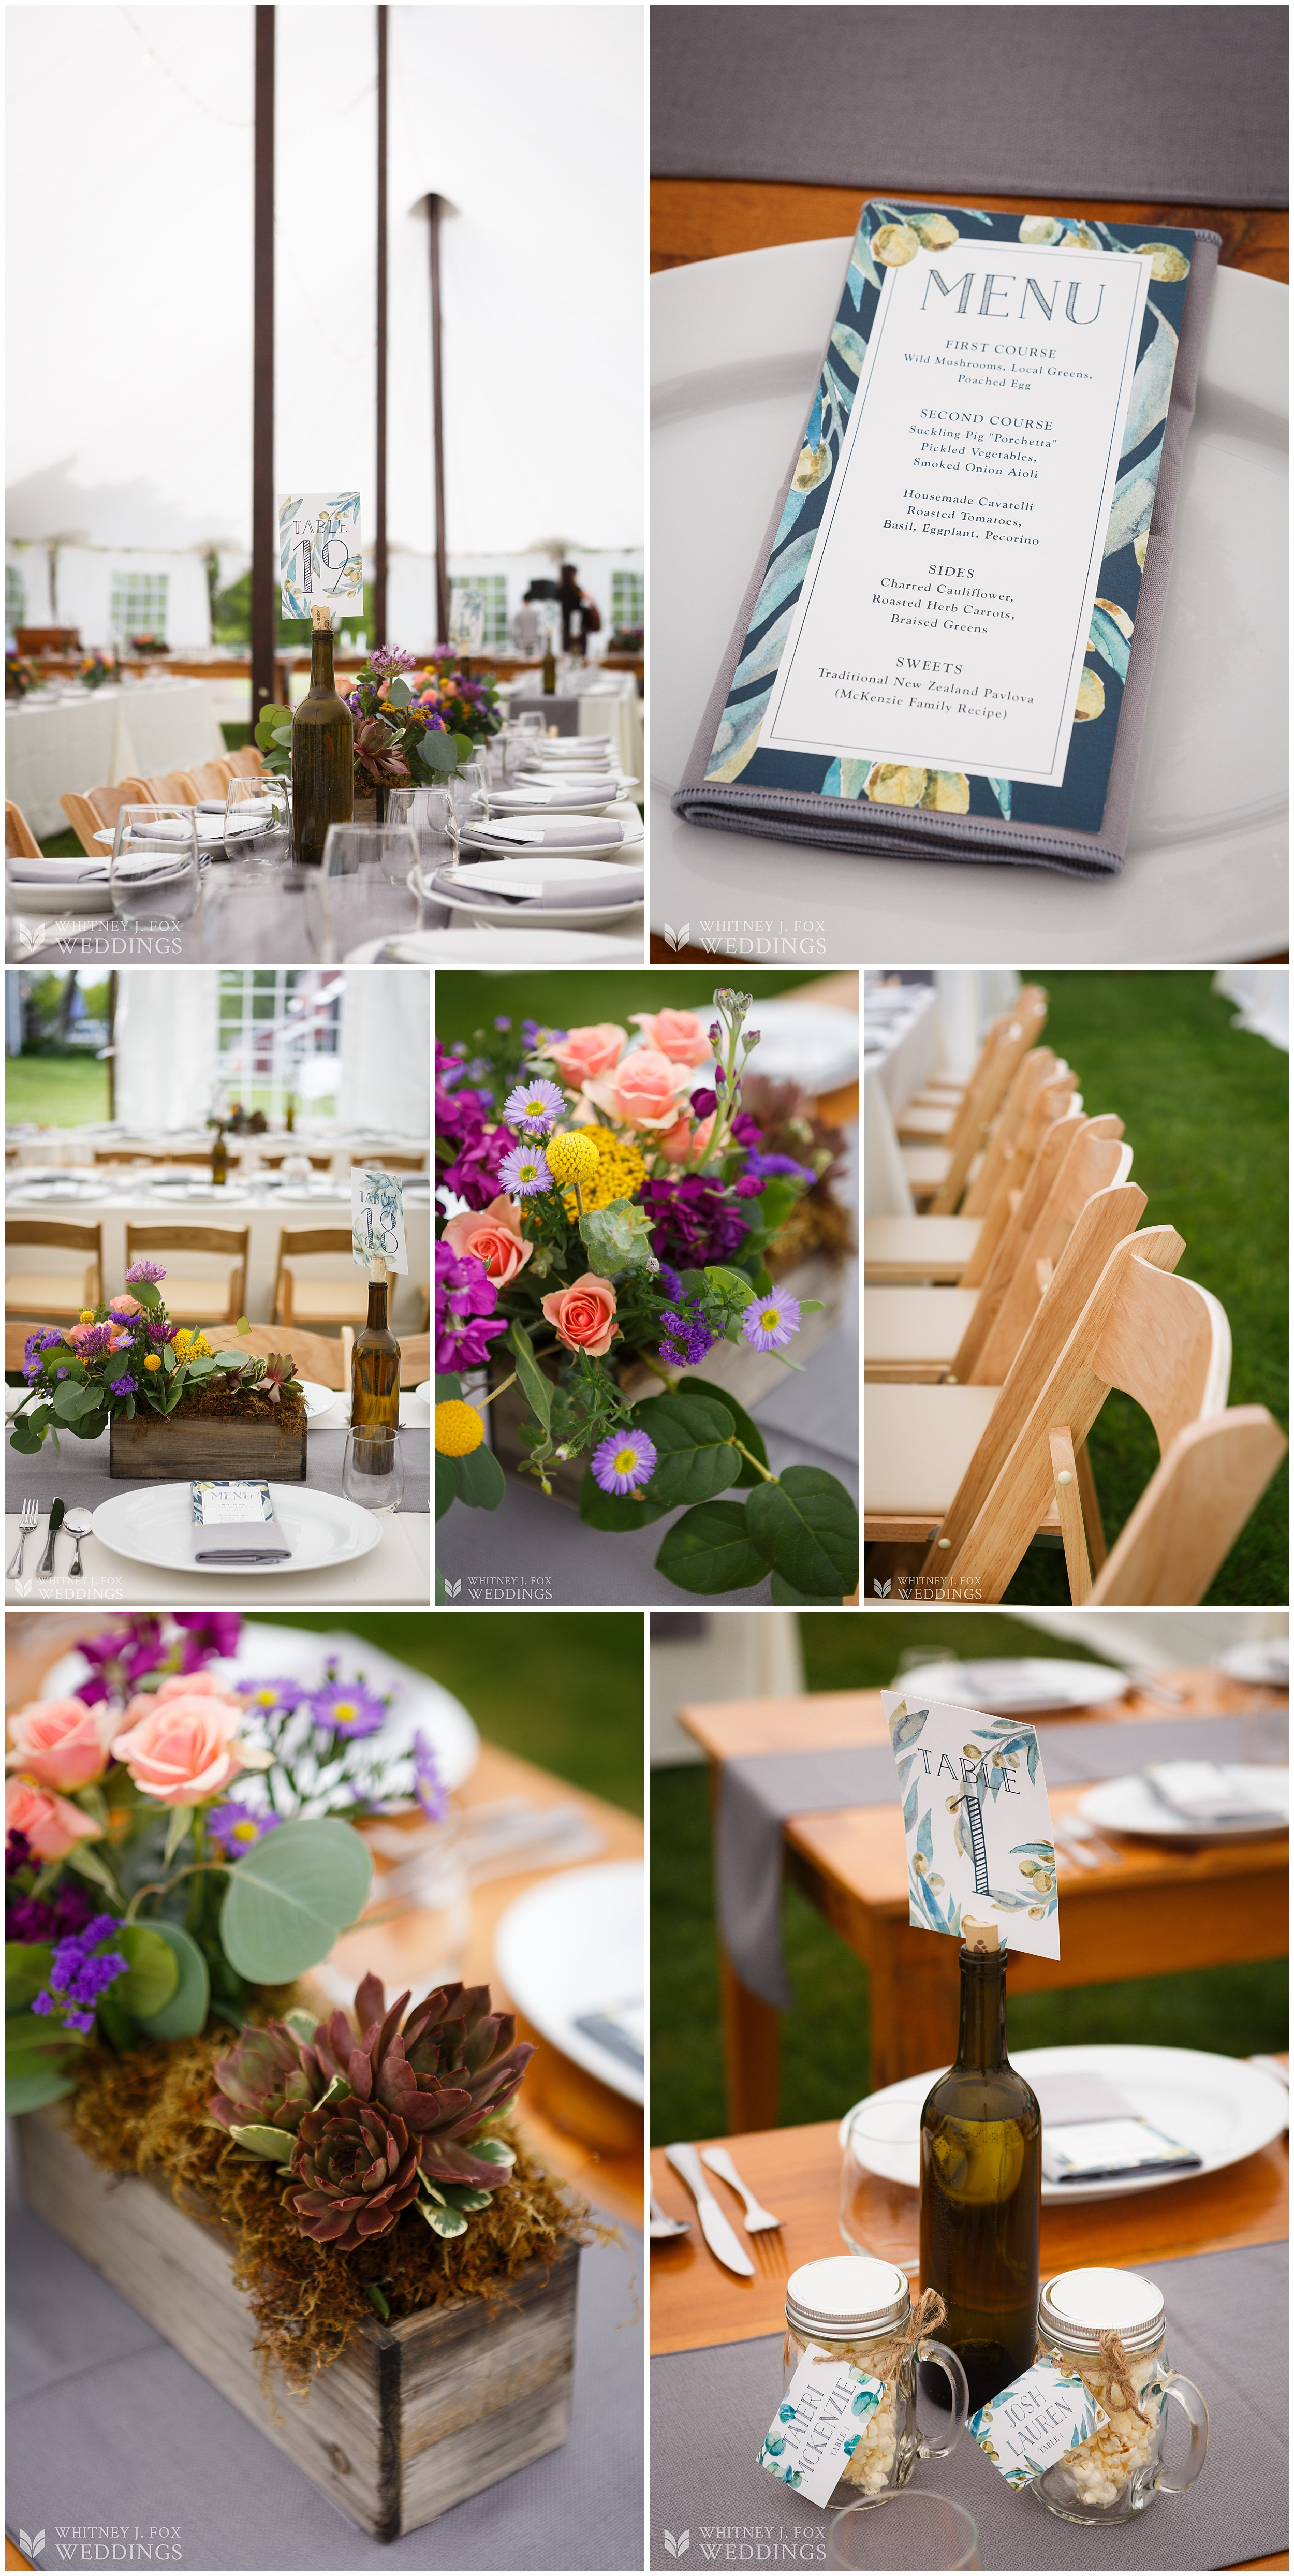 9_18_tai_josh_the_homestead_rest_be_thankful_farm_lyman_maine_photographer_whitney_j_fox_weddings_9282.jpg